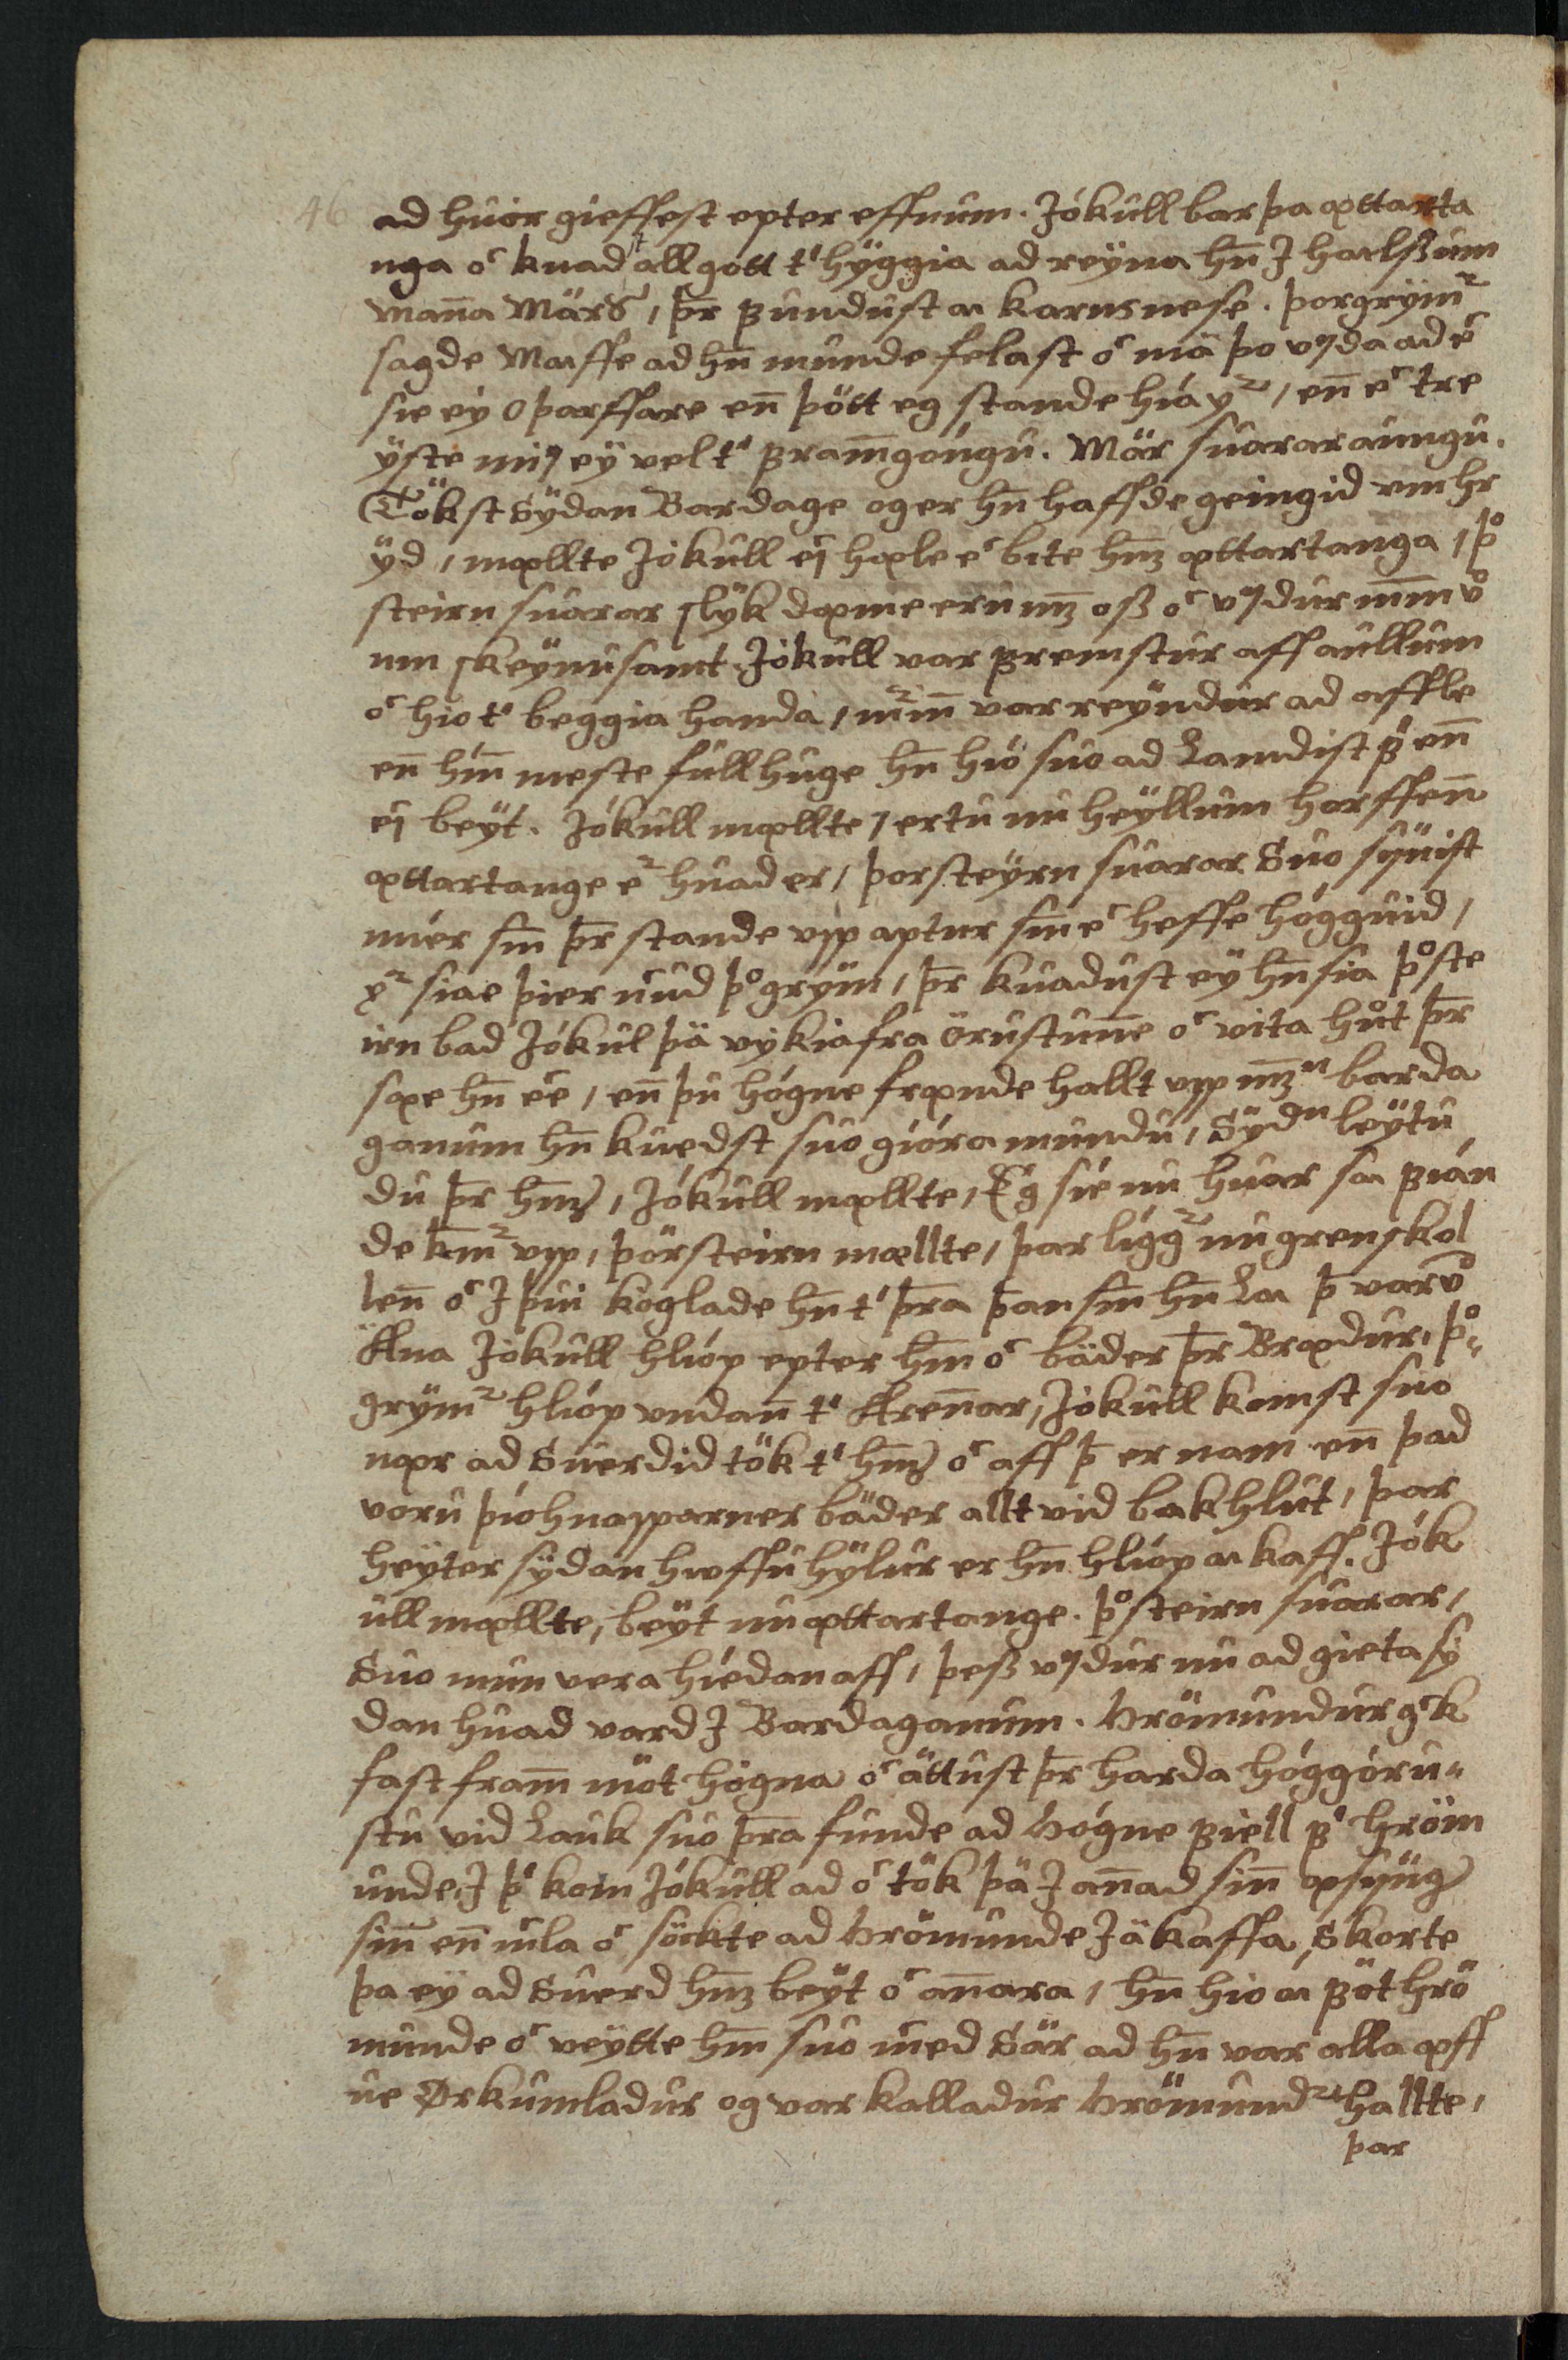 AM 138 fol - 23v